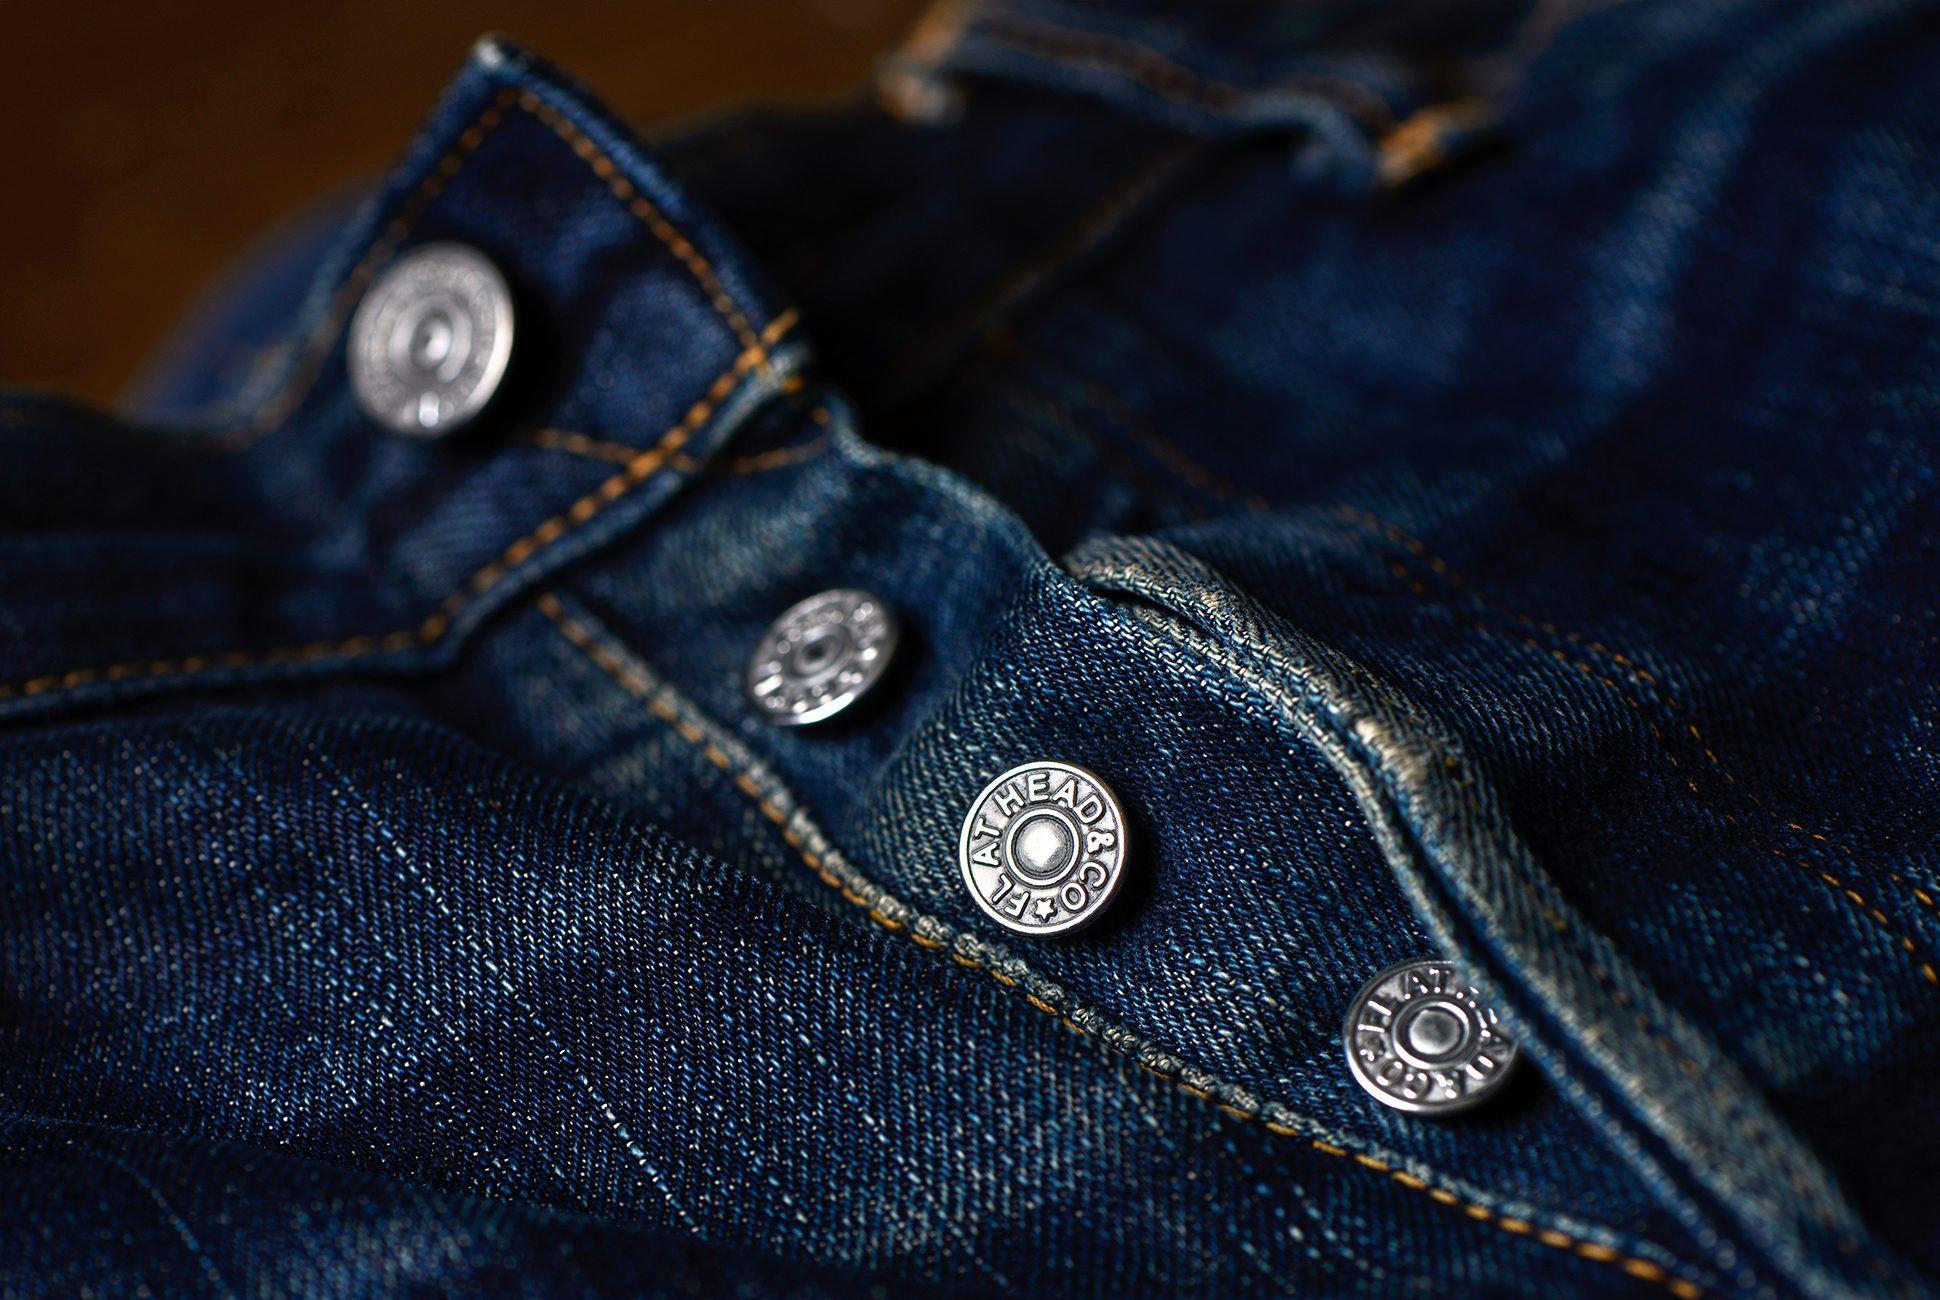 quality-jeans-gear-patrol-970-5